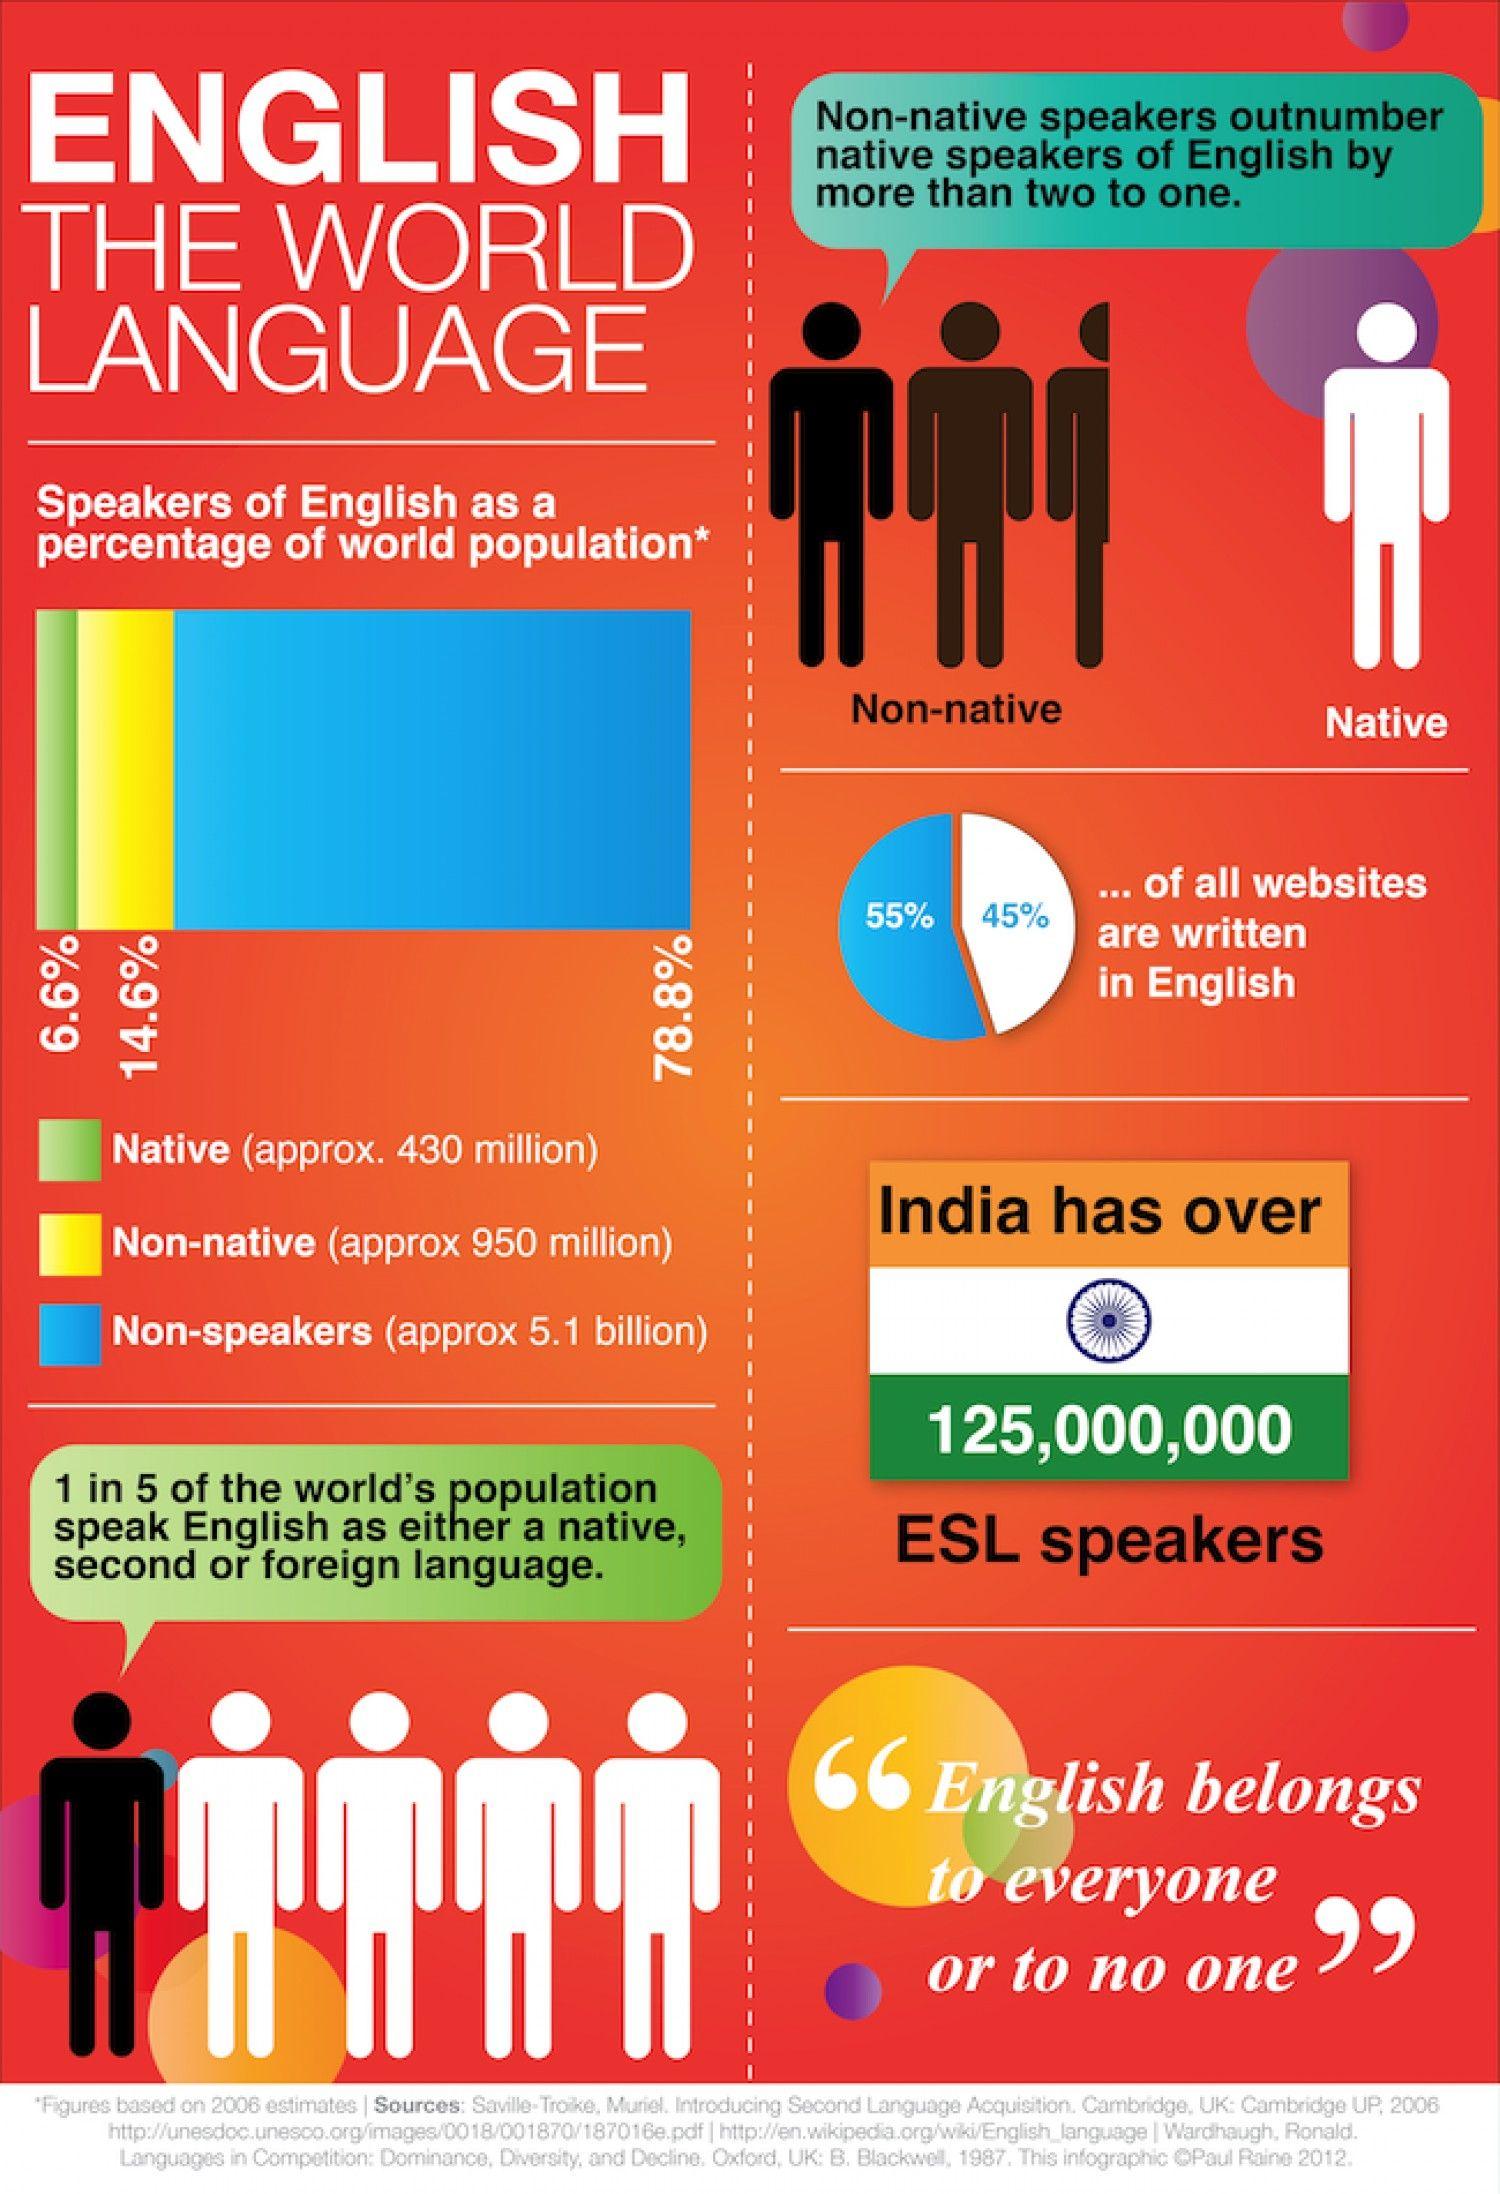 English The World Language Infographic